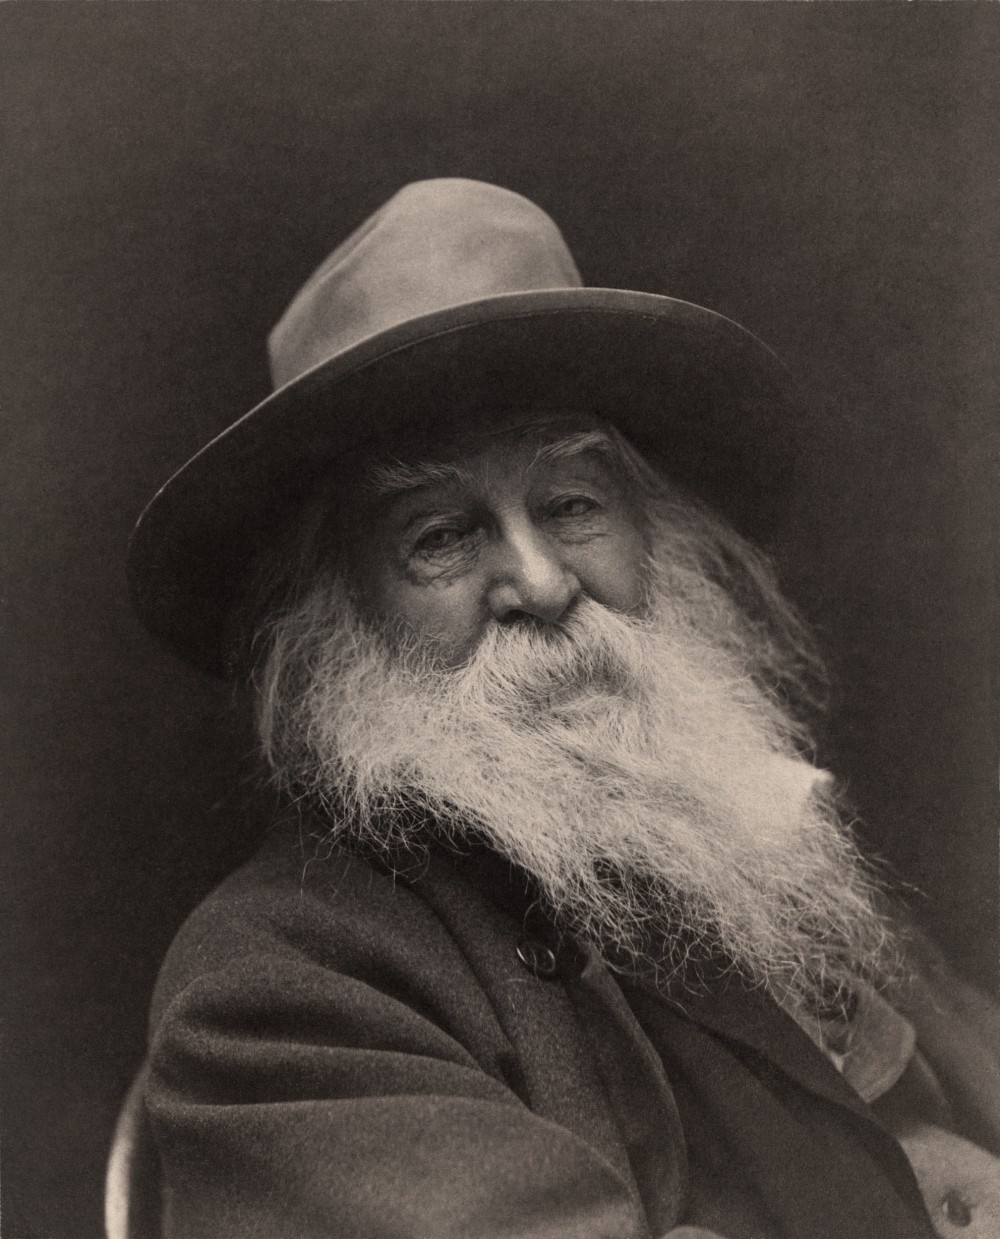 A Little Walt Whitman is Good for the Soul